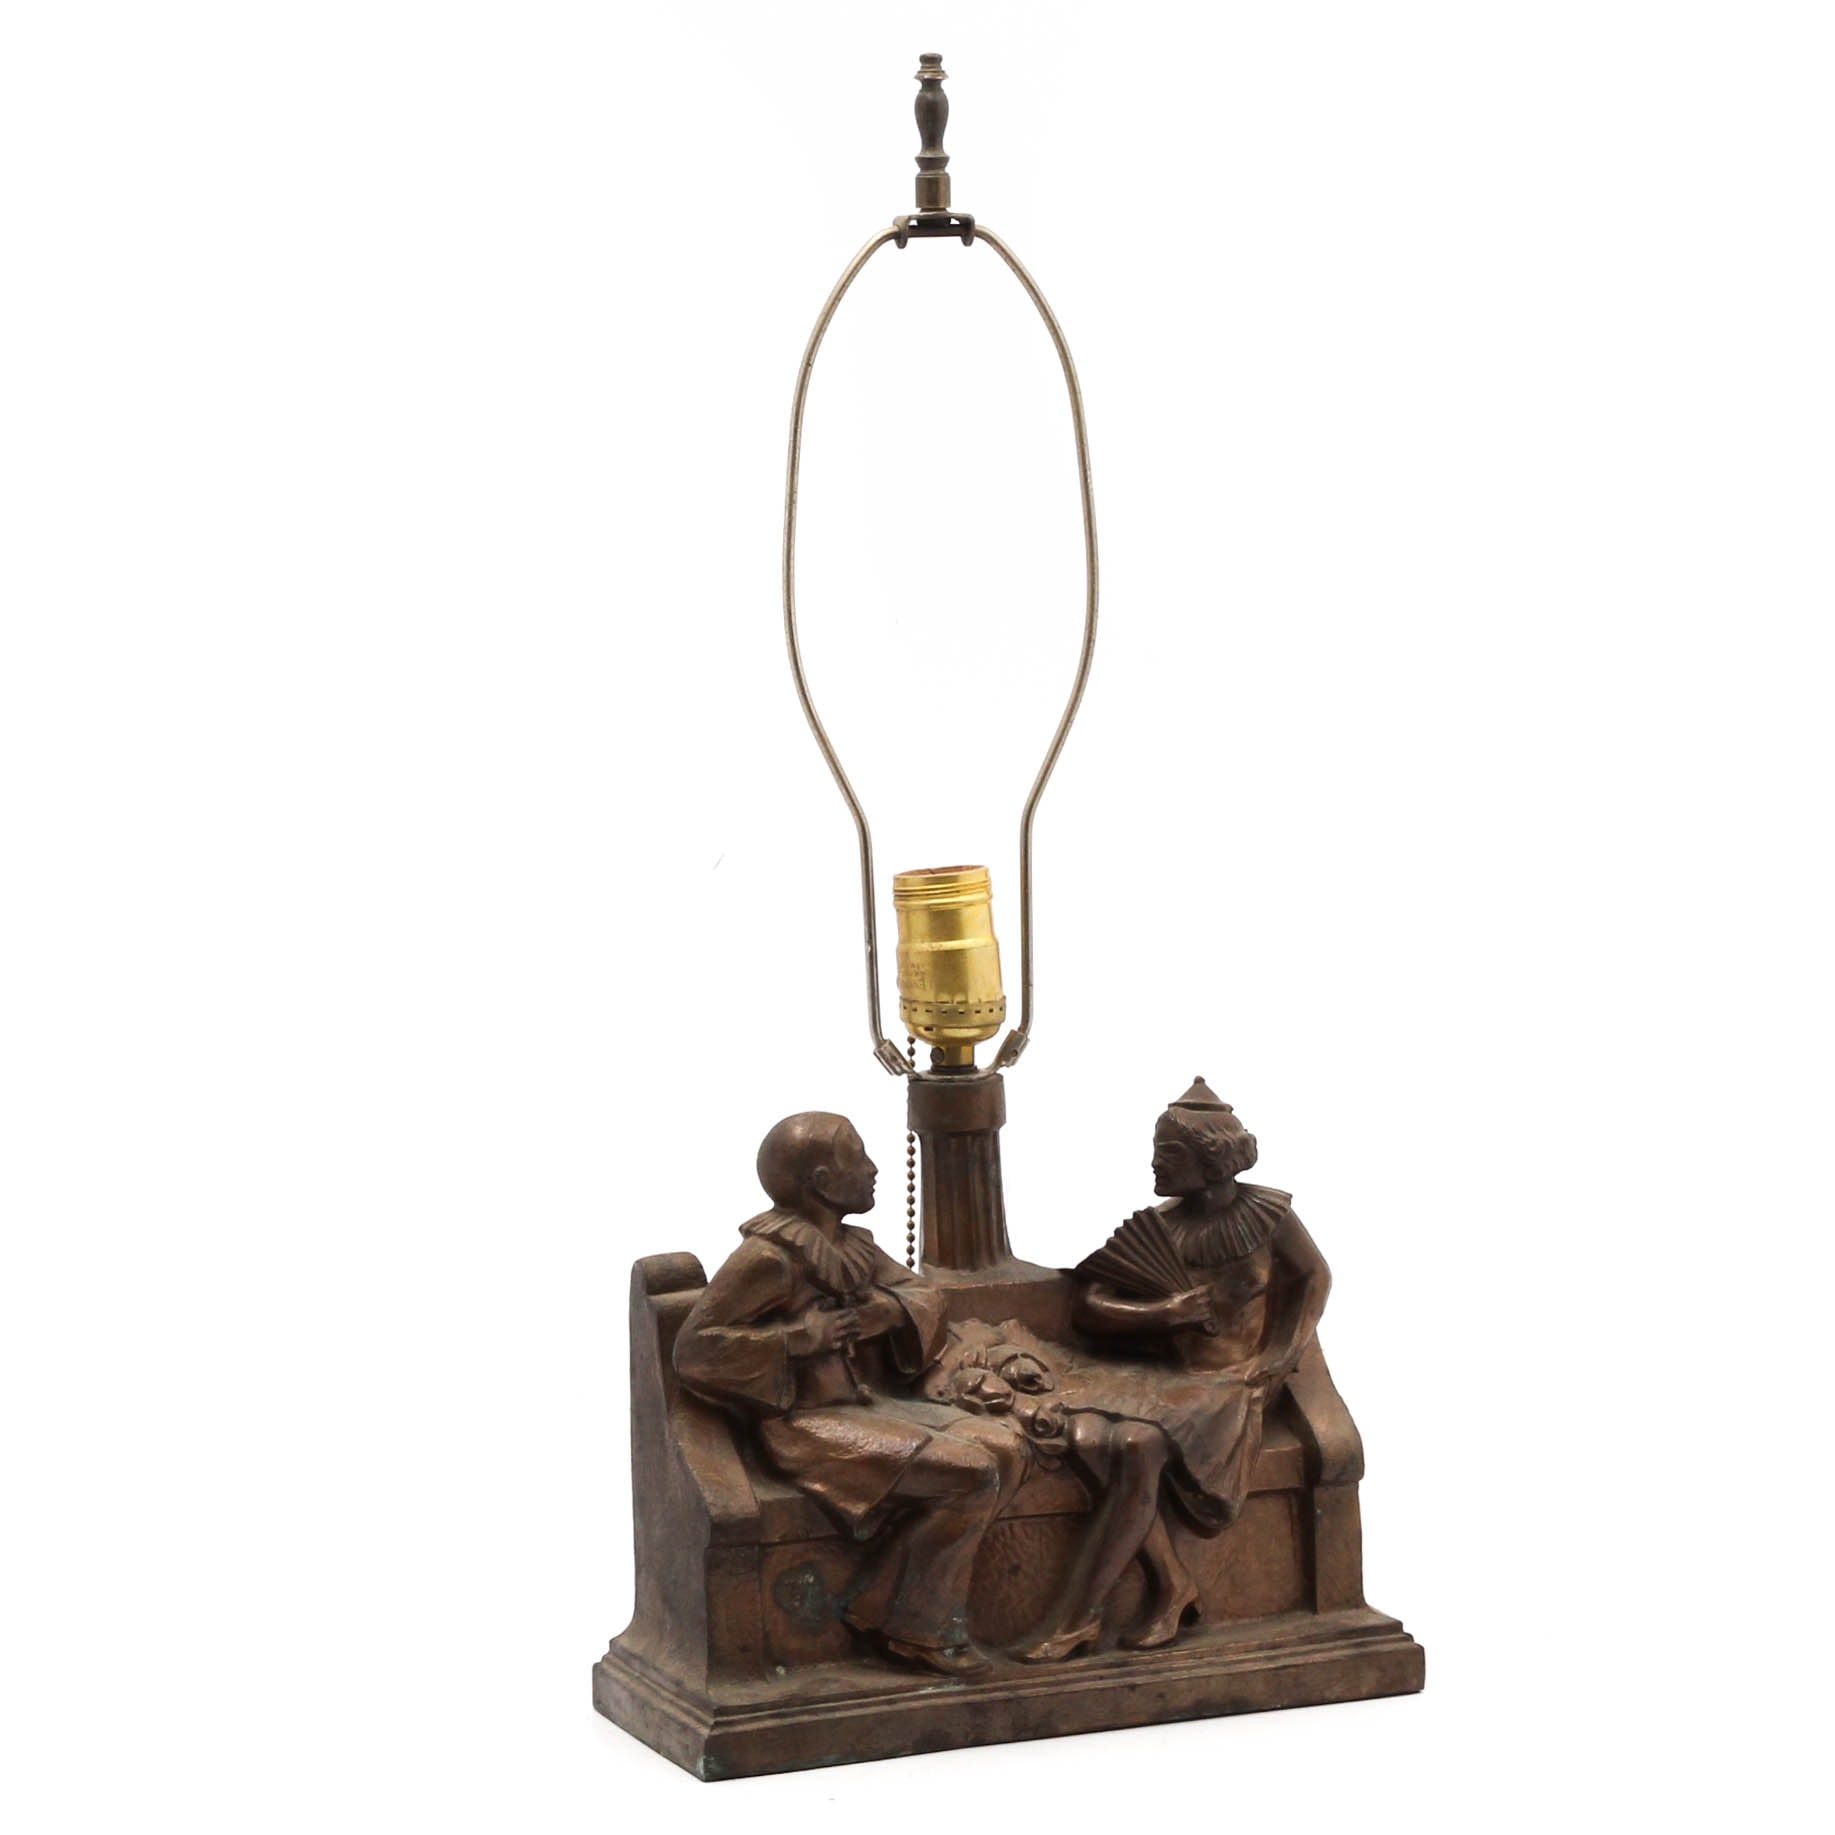 Art Nouveau Style Figural Courting Couple Cast Metal Table Lamp, Mid-Century